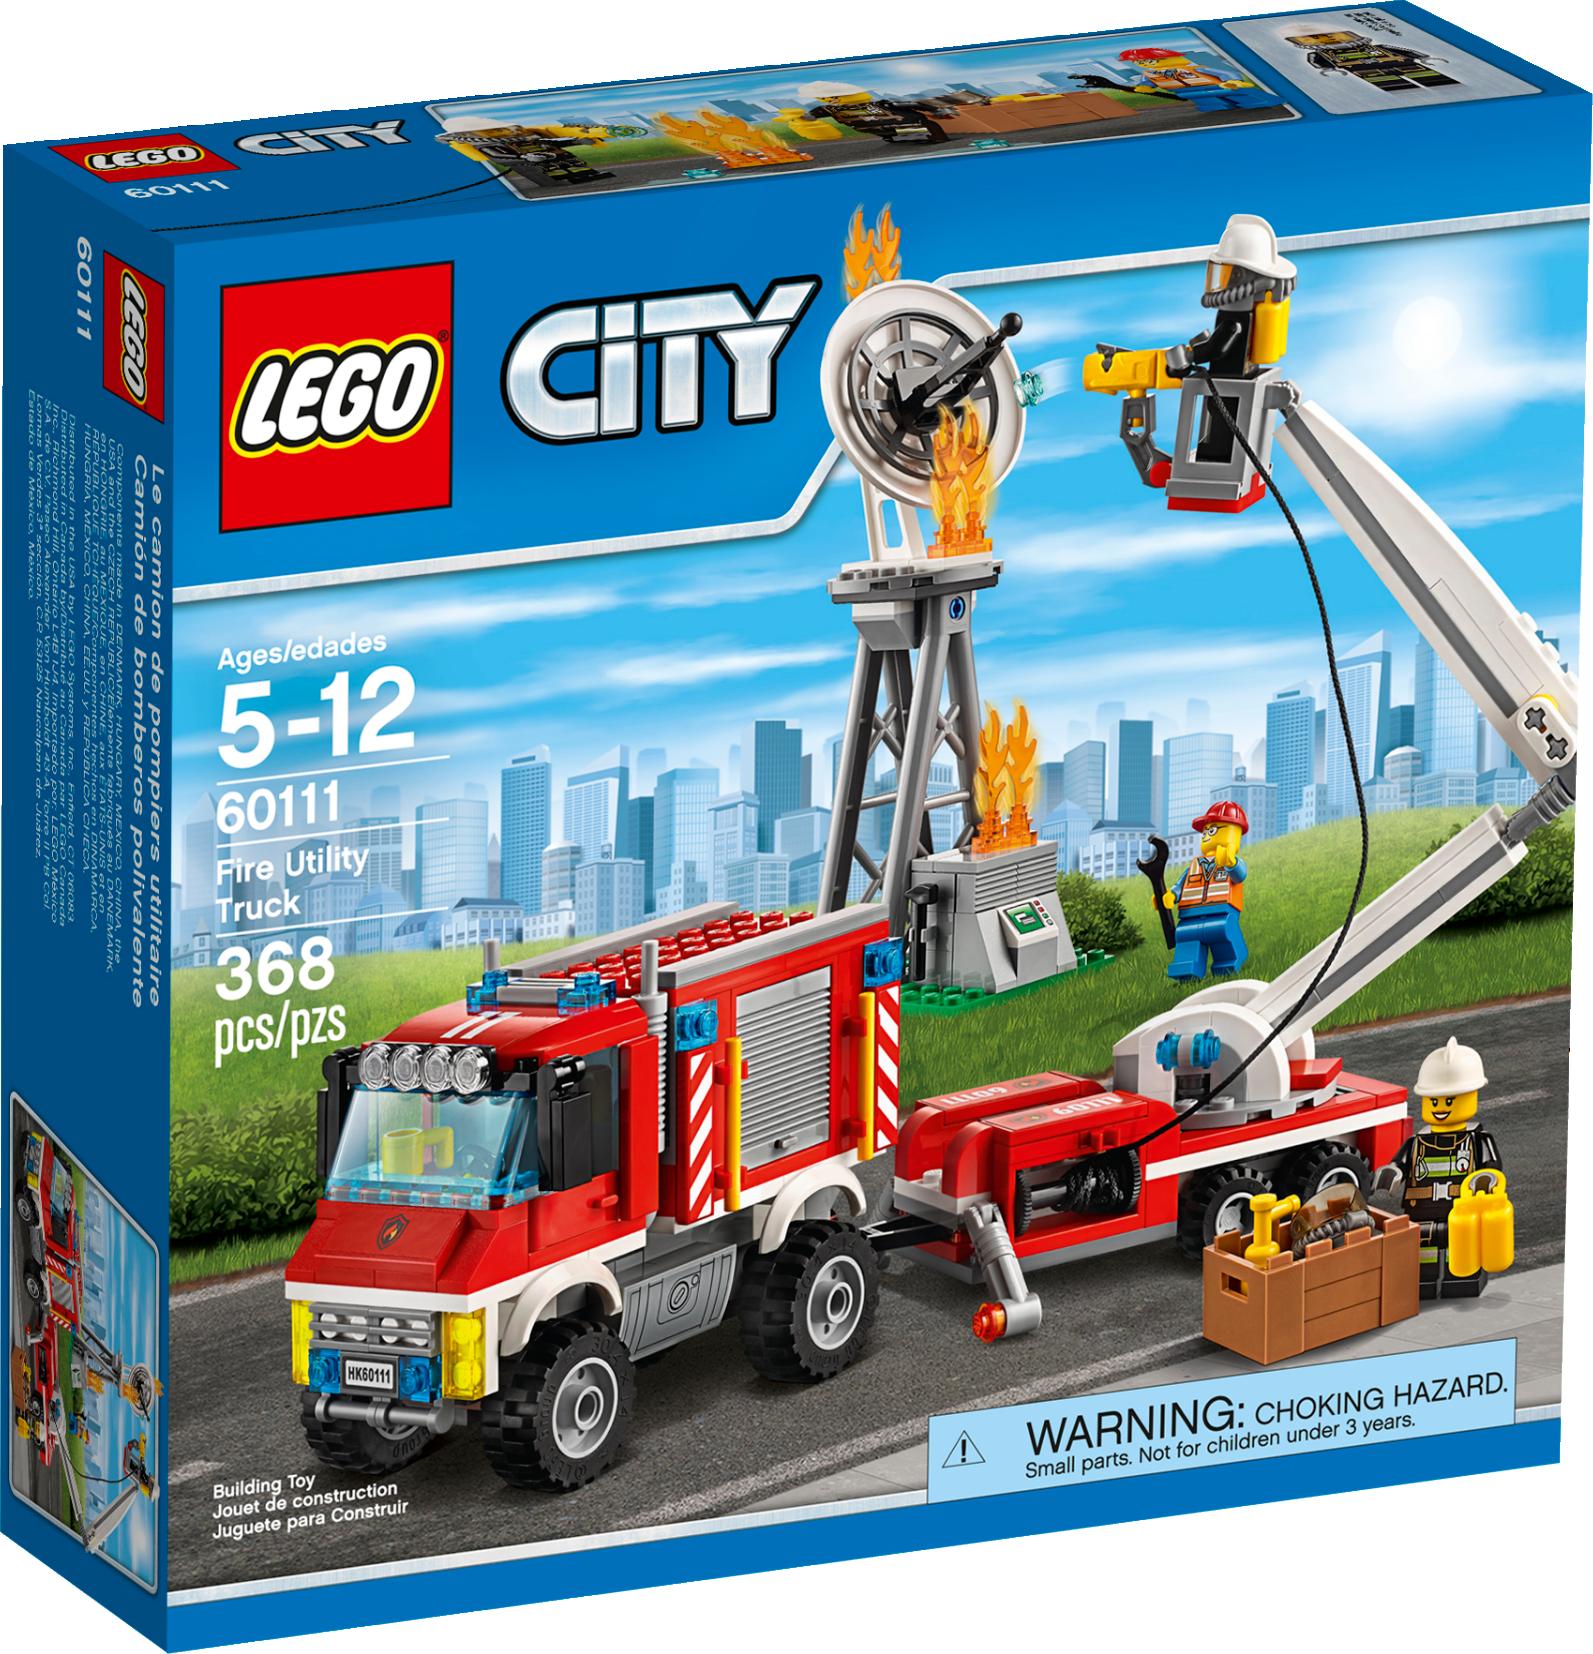 Fire Utility Truck